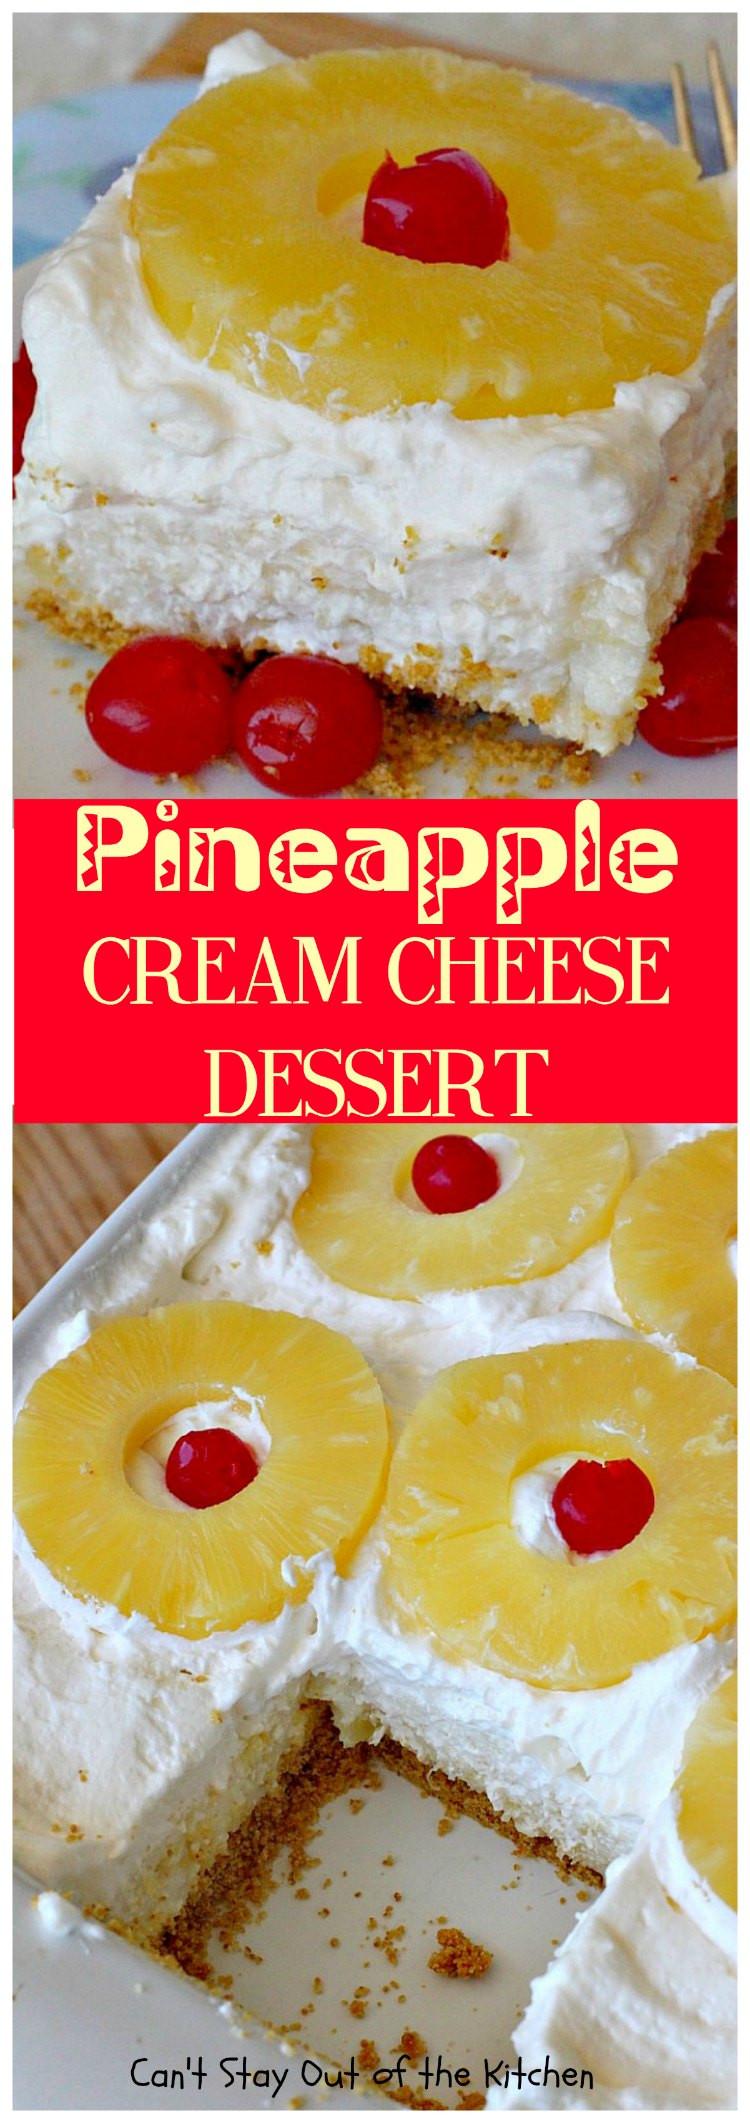 Desserts With Cream Cheese  pineapple cool whip dessert graham cracker crust